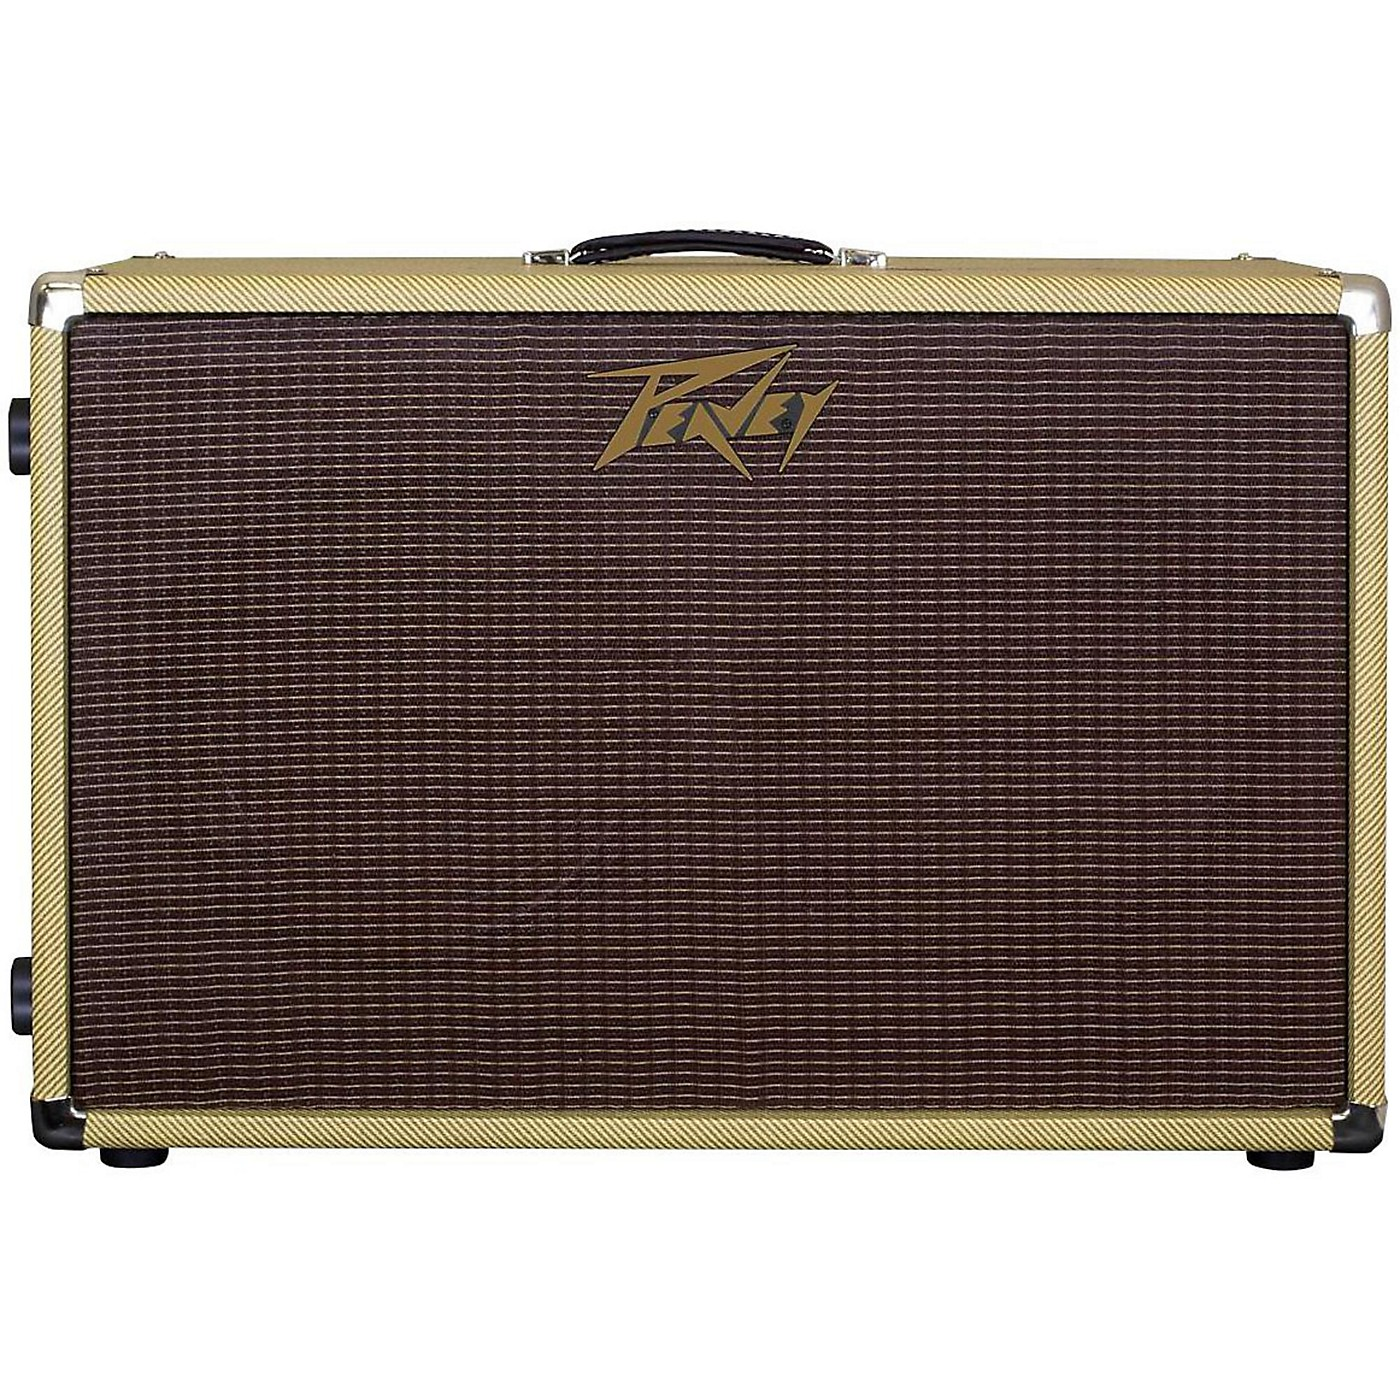 Peavey 212-C 60W 2x12 Guitar Speaker Cabinet thumbnail